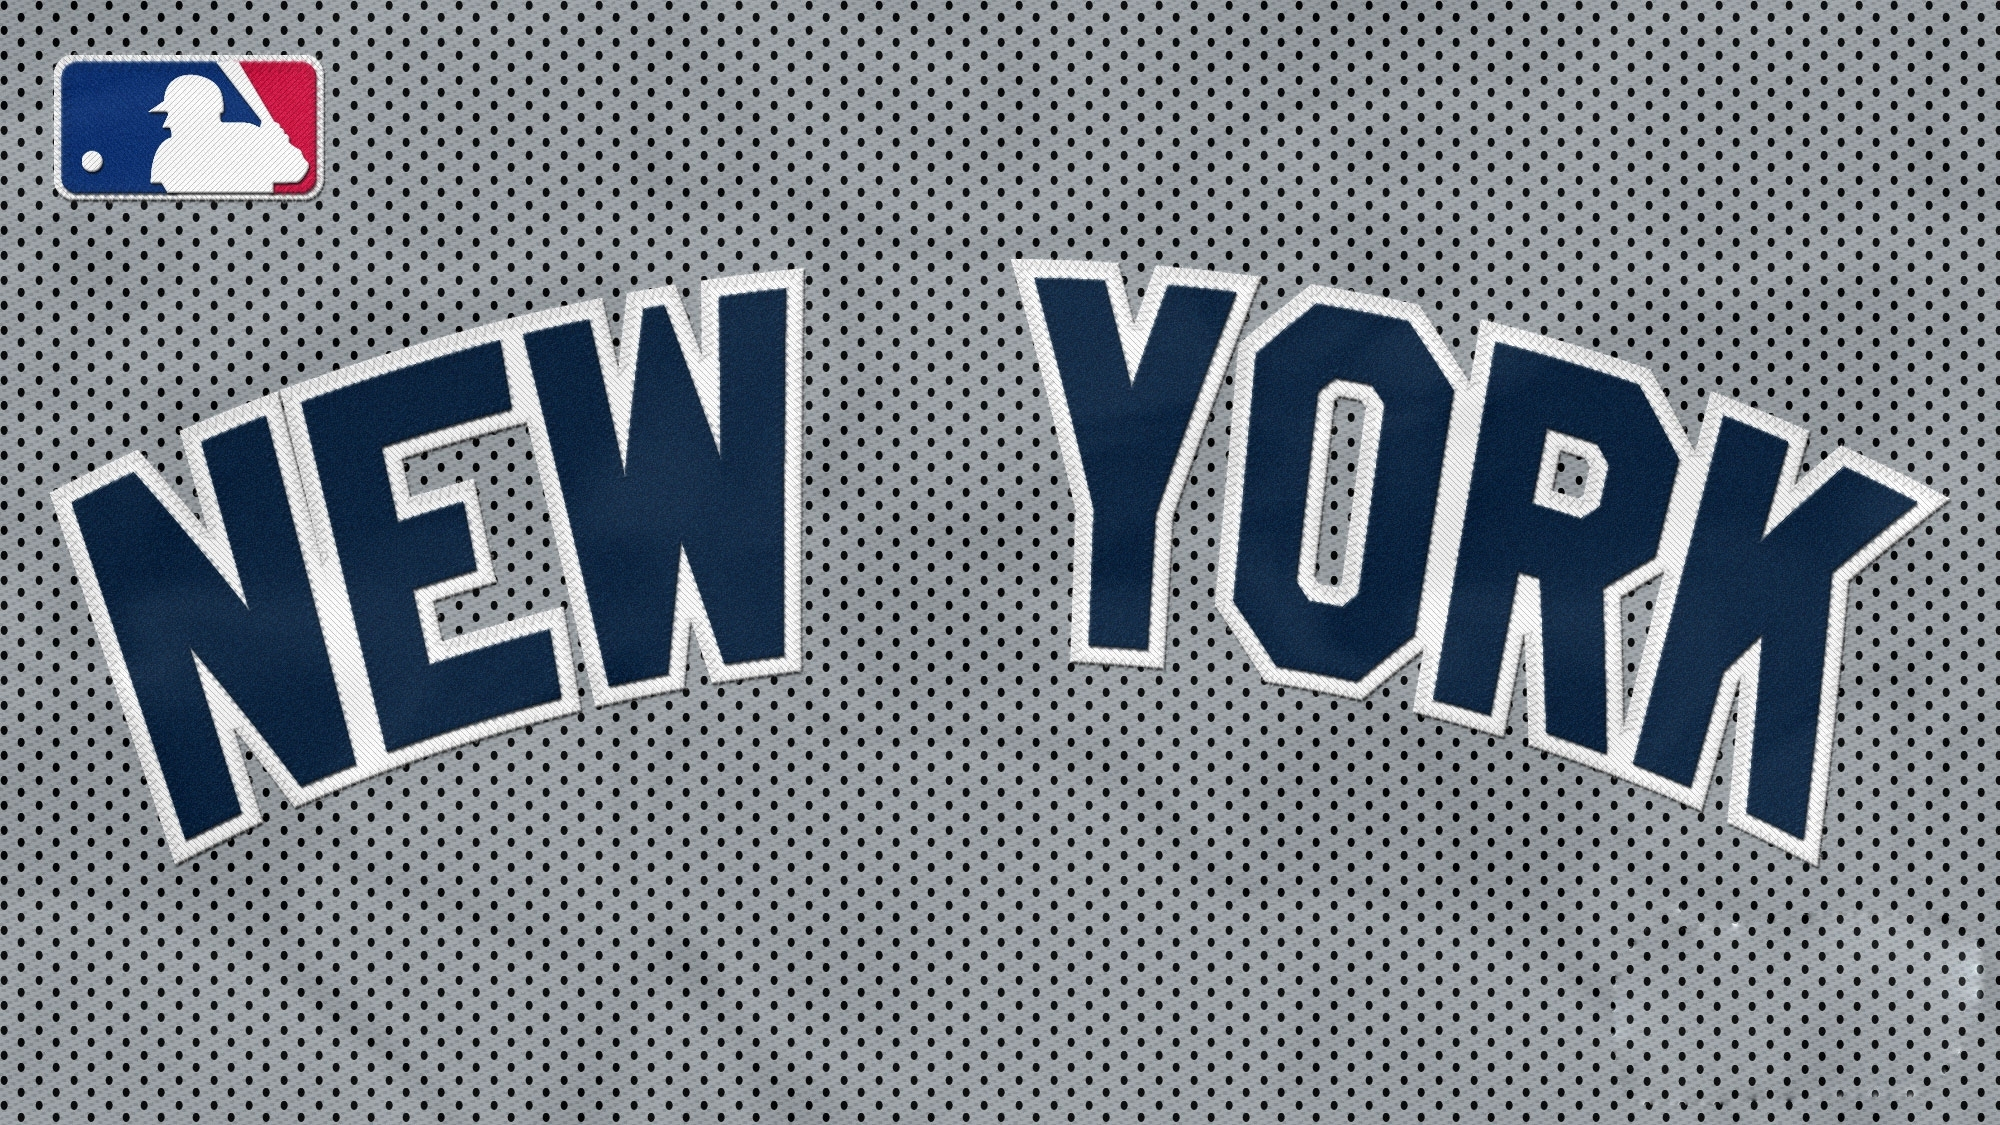 new york yankees wallpapers hd | pixelstalk